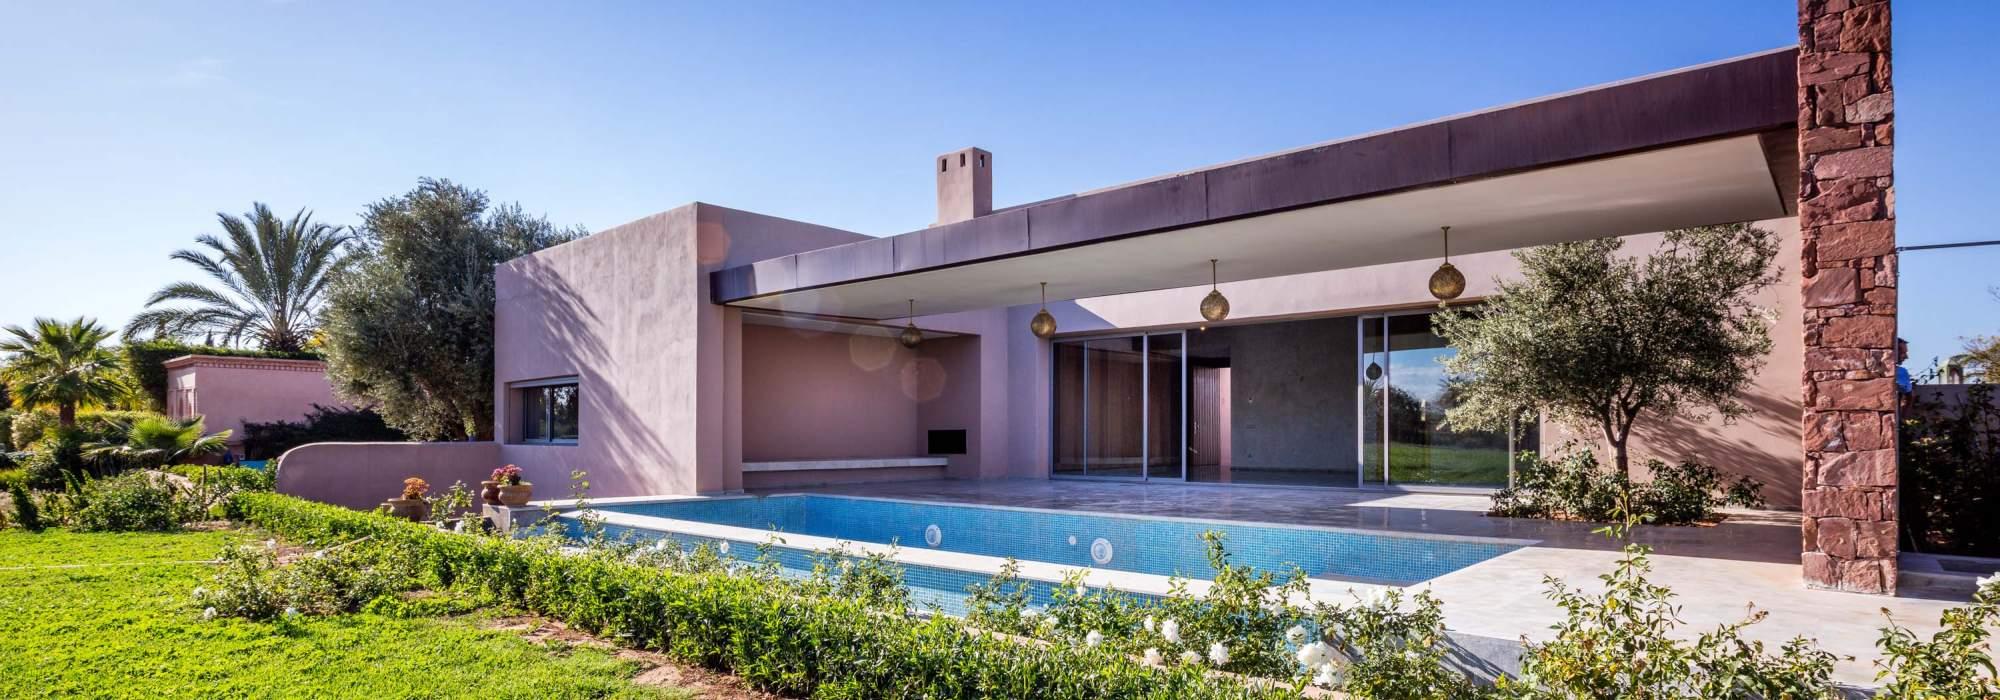 Villa Contemporaine a vendre golf amelkis marrakech